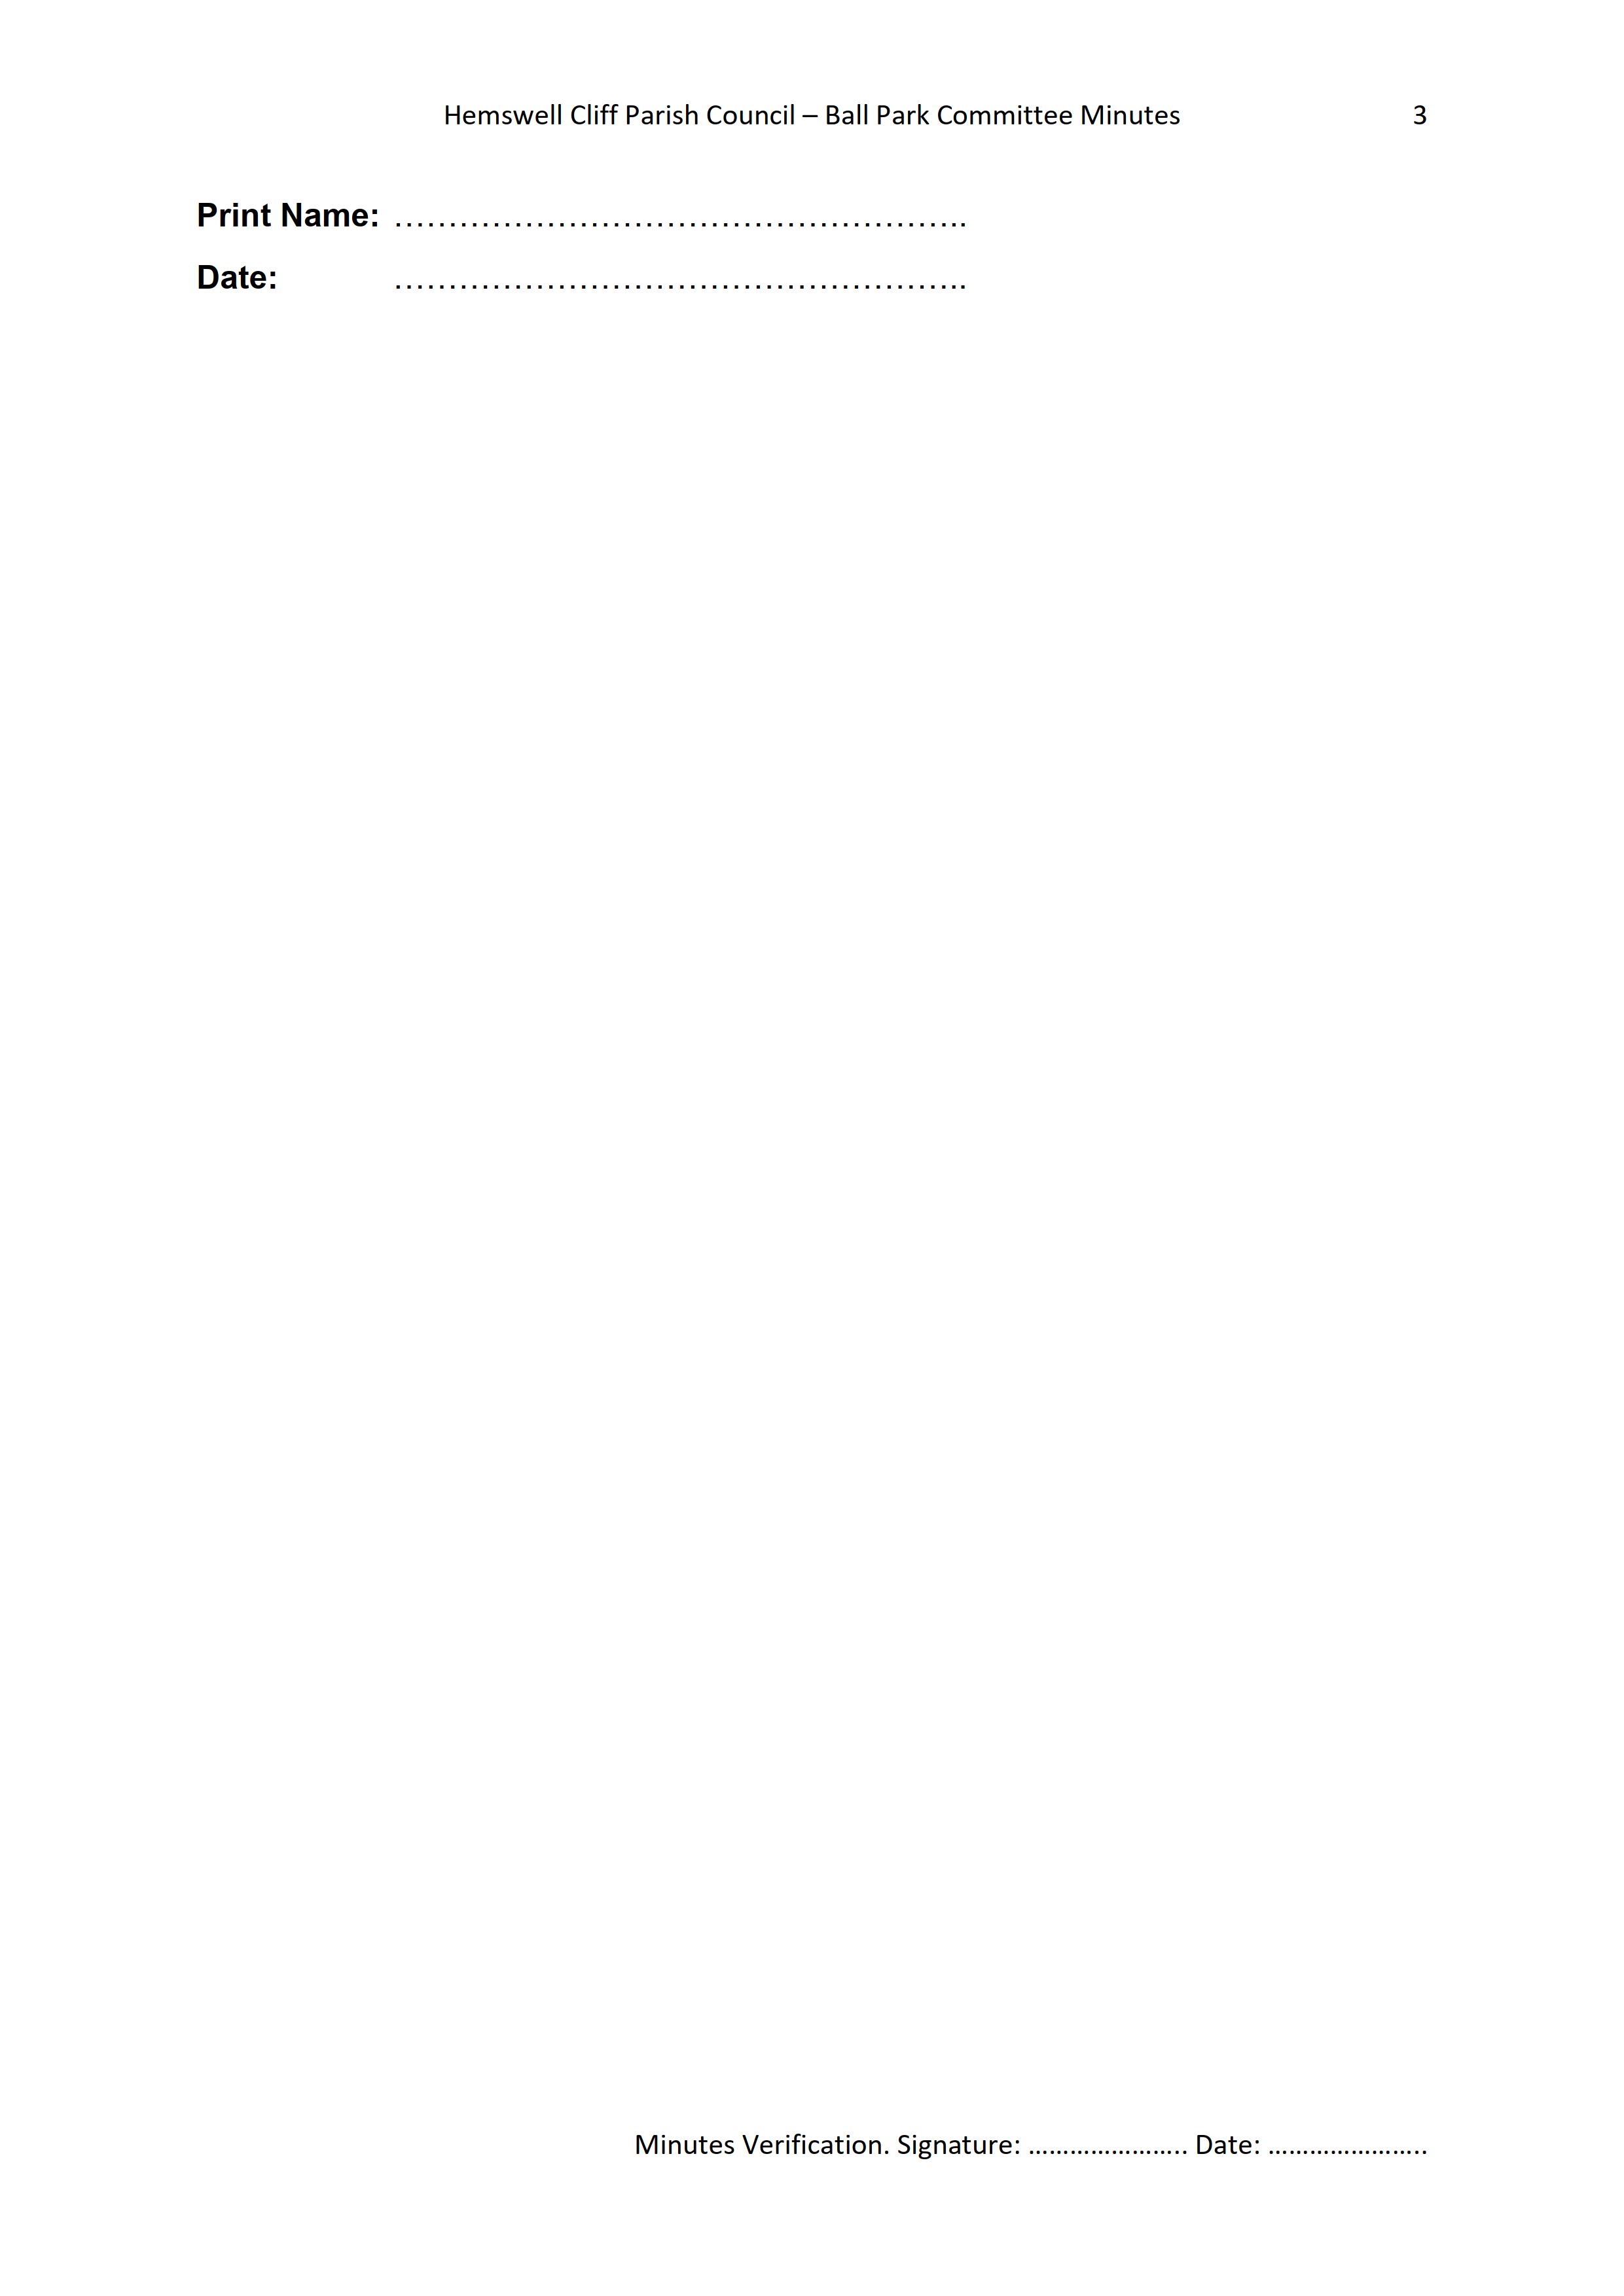 HCPC_BallPark_Minutes_02.03.20_3.png